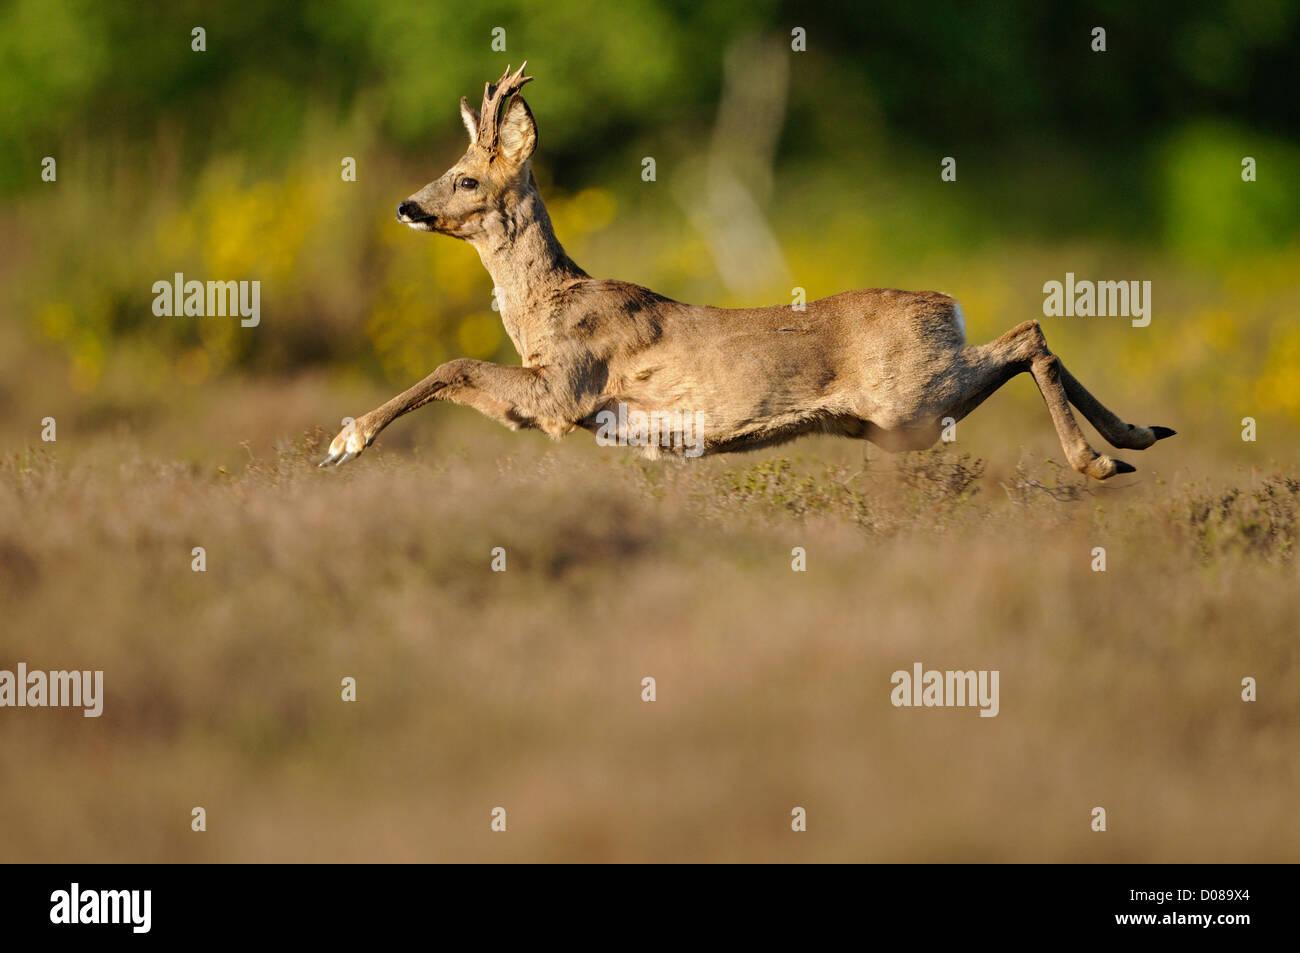 Western-Reh (Capreolus Capreolus) Männchen läuft durch Heidekraut, Holland, Mai Stockbild